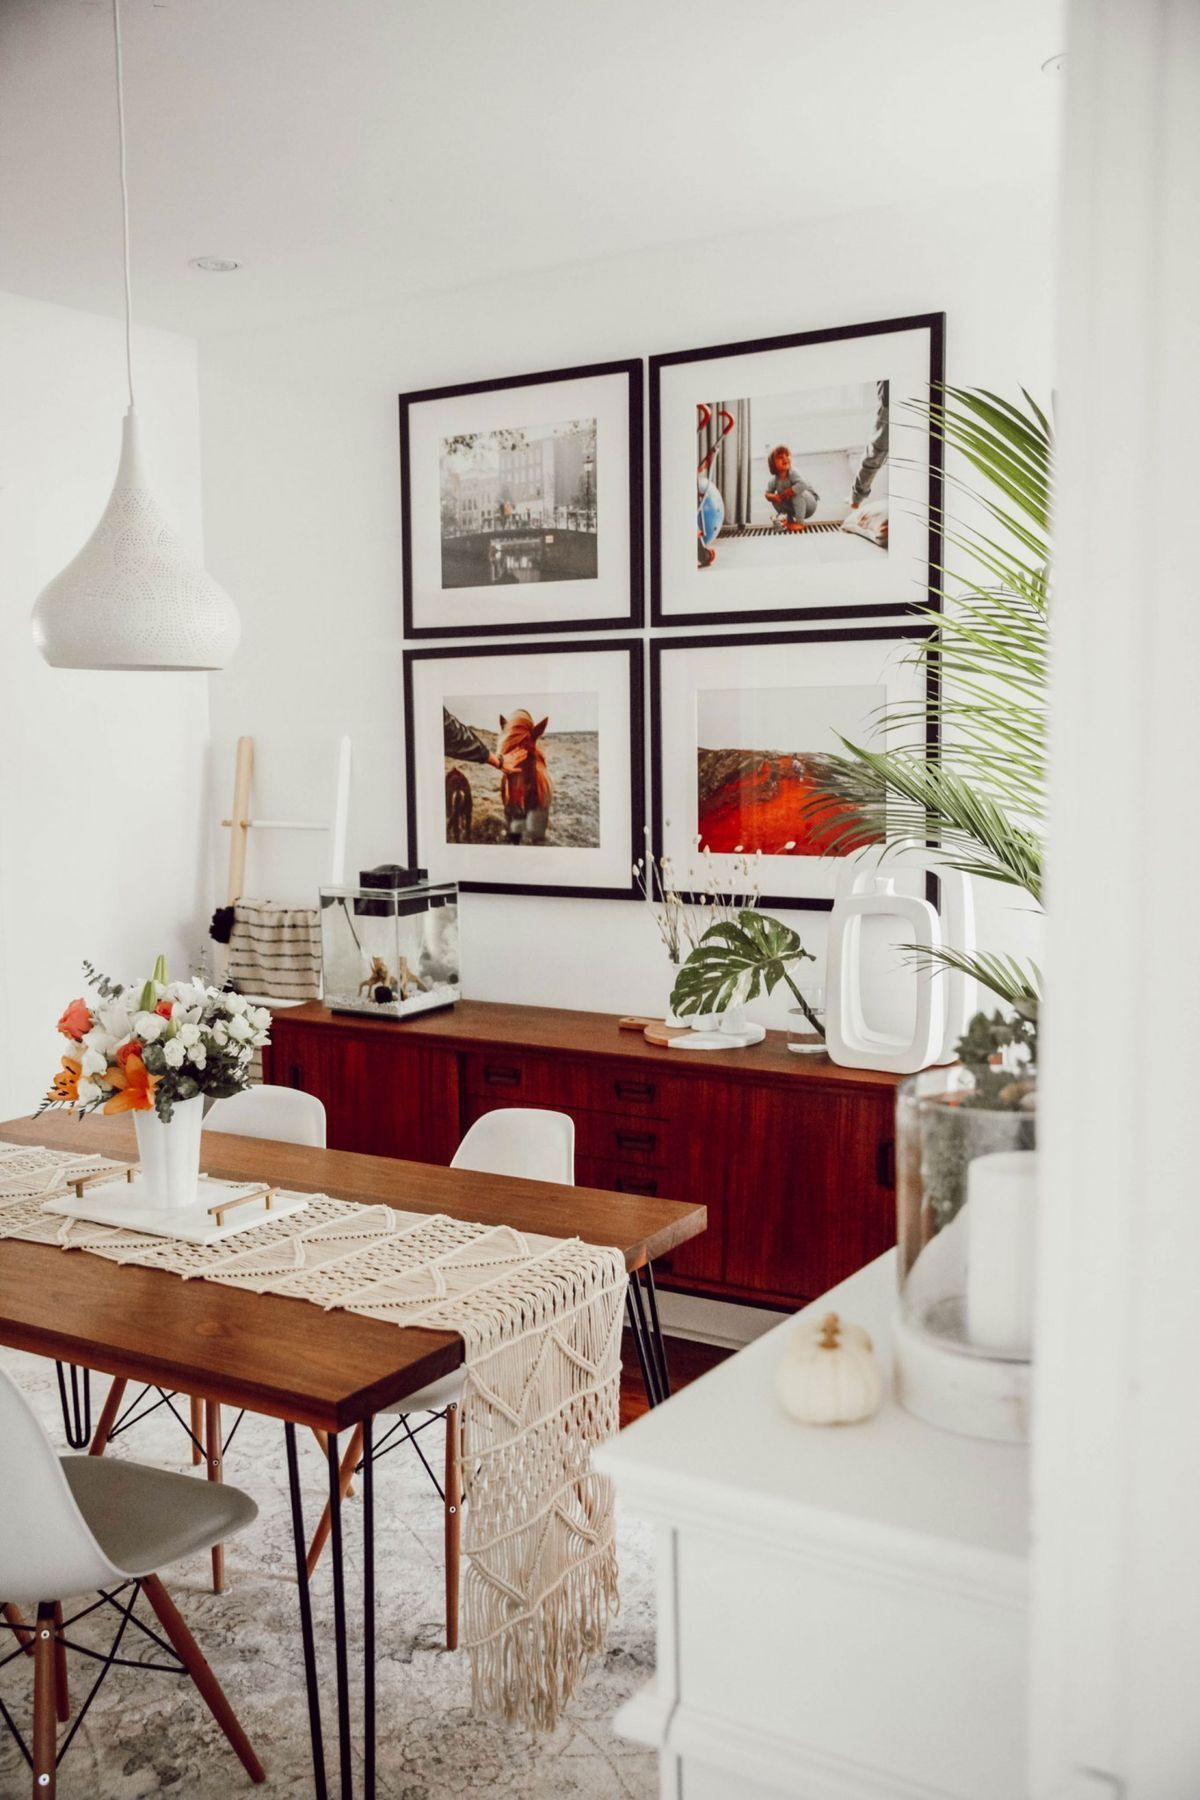 living room decor ideas remodeling inspiration bohemian chic fashion bohemian style boho li on boho chic dining room kitchen dining tables id=46455